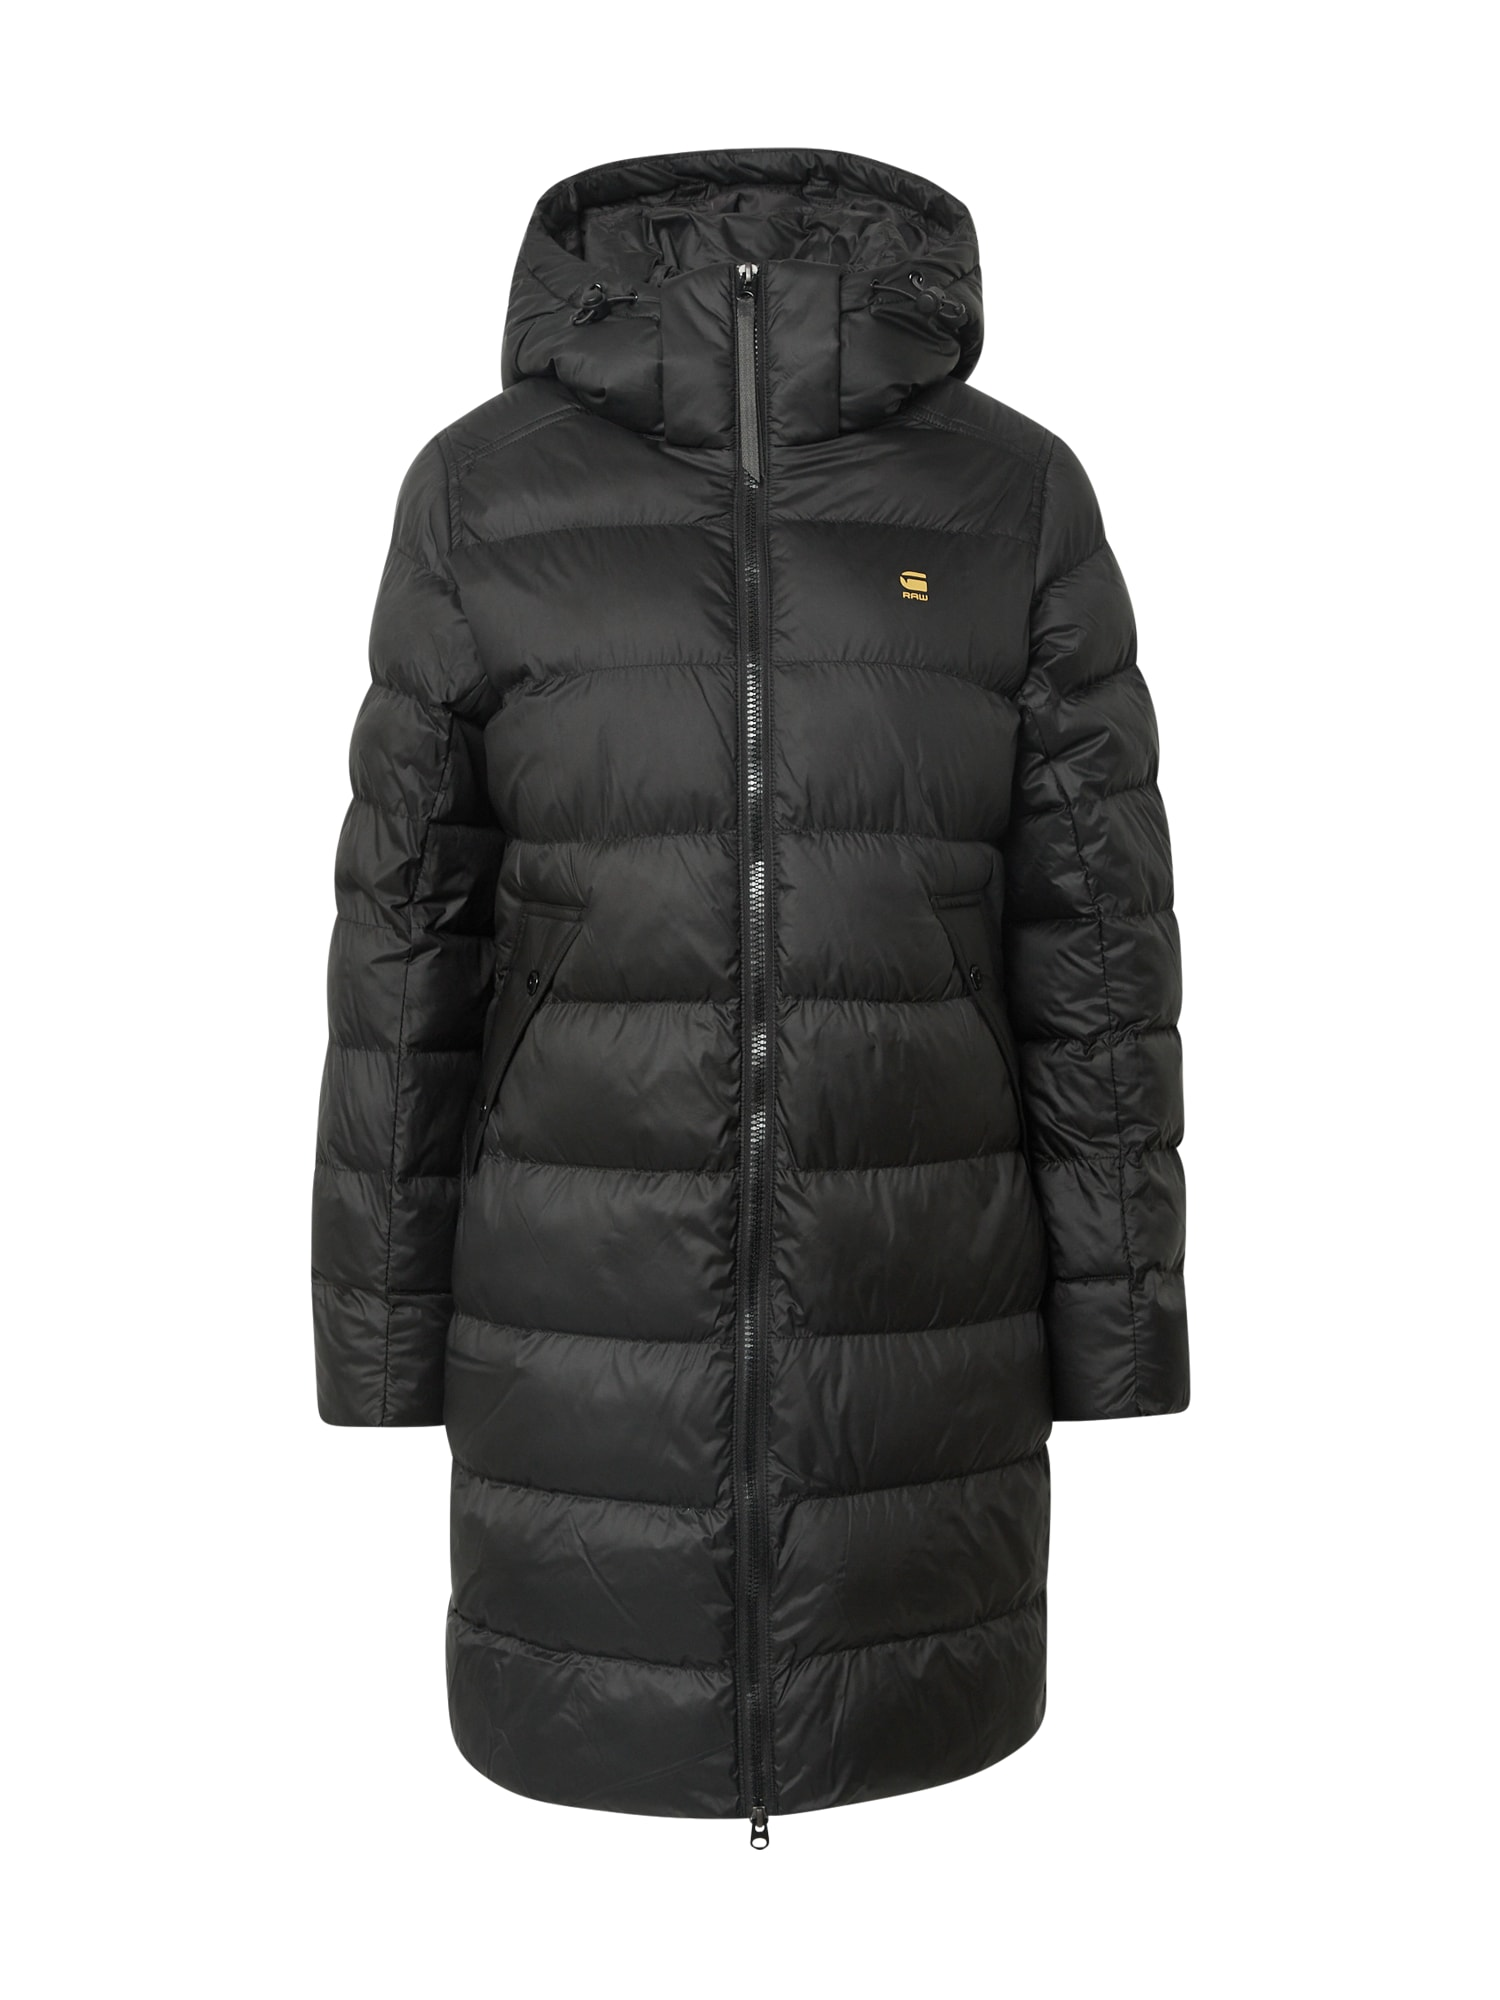 G-Star RAW Demisezoninis paltas